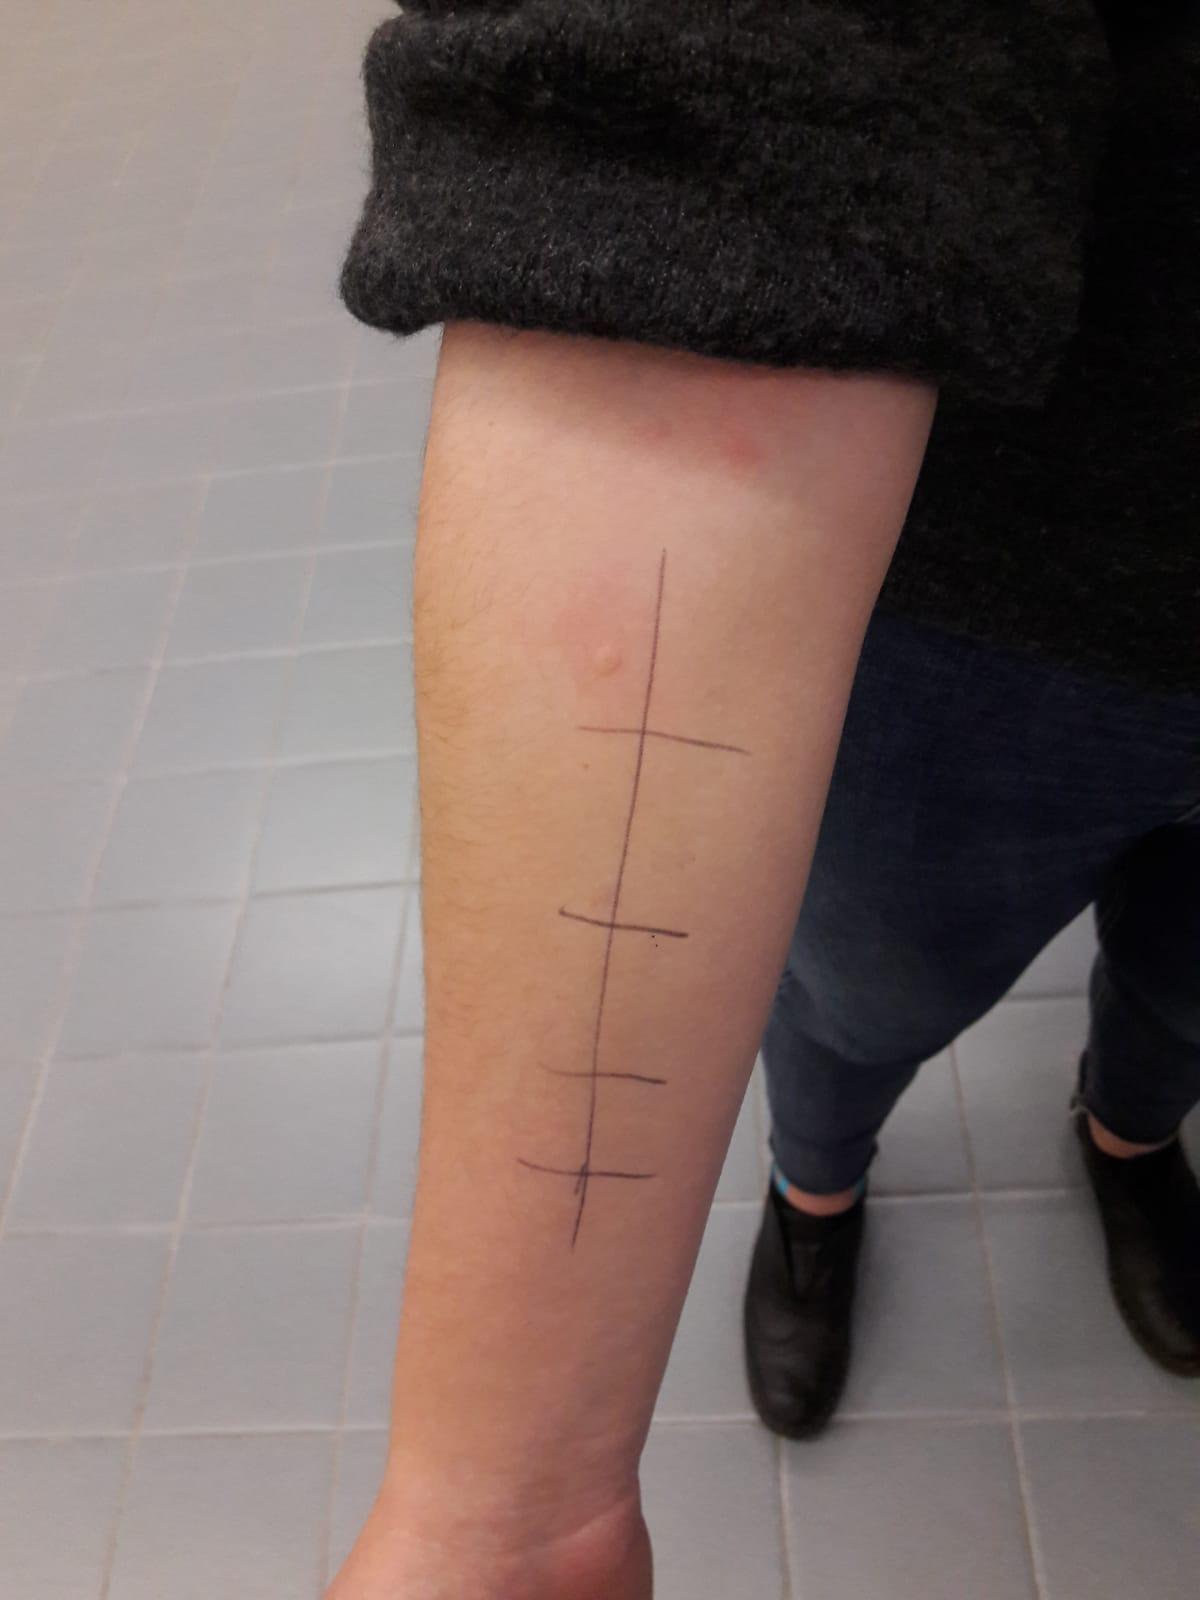 Prove allergiche cutanee - prick test